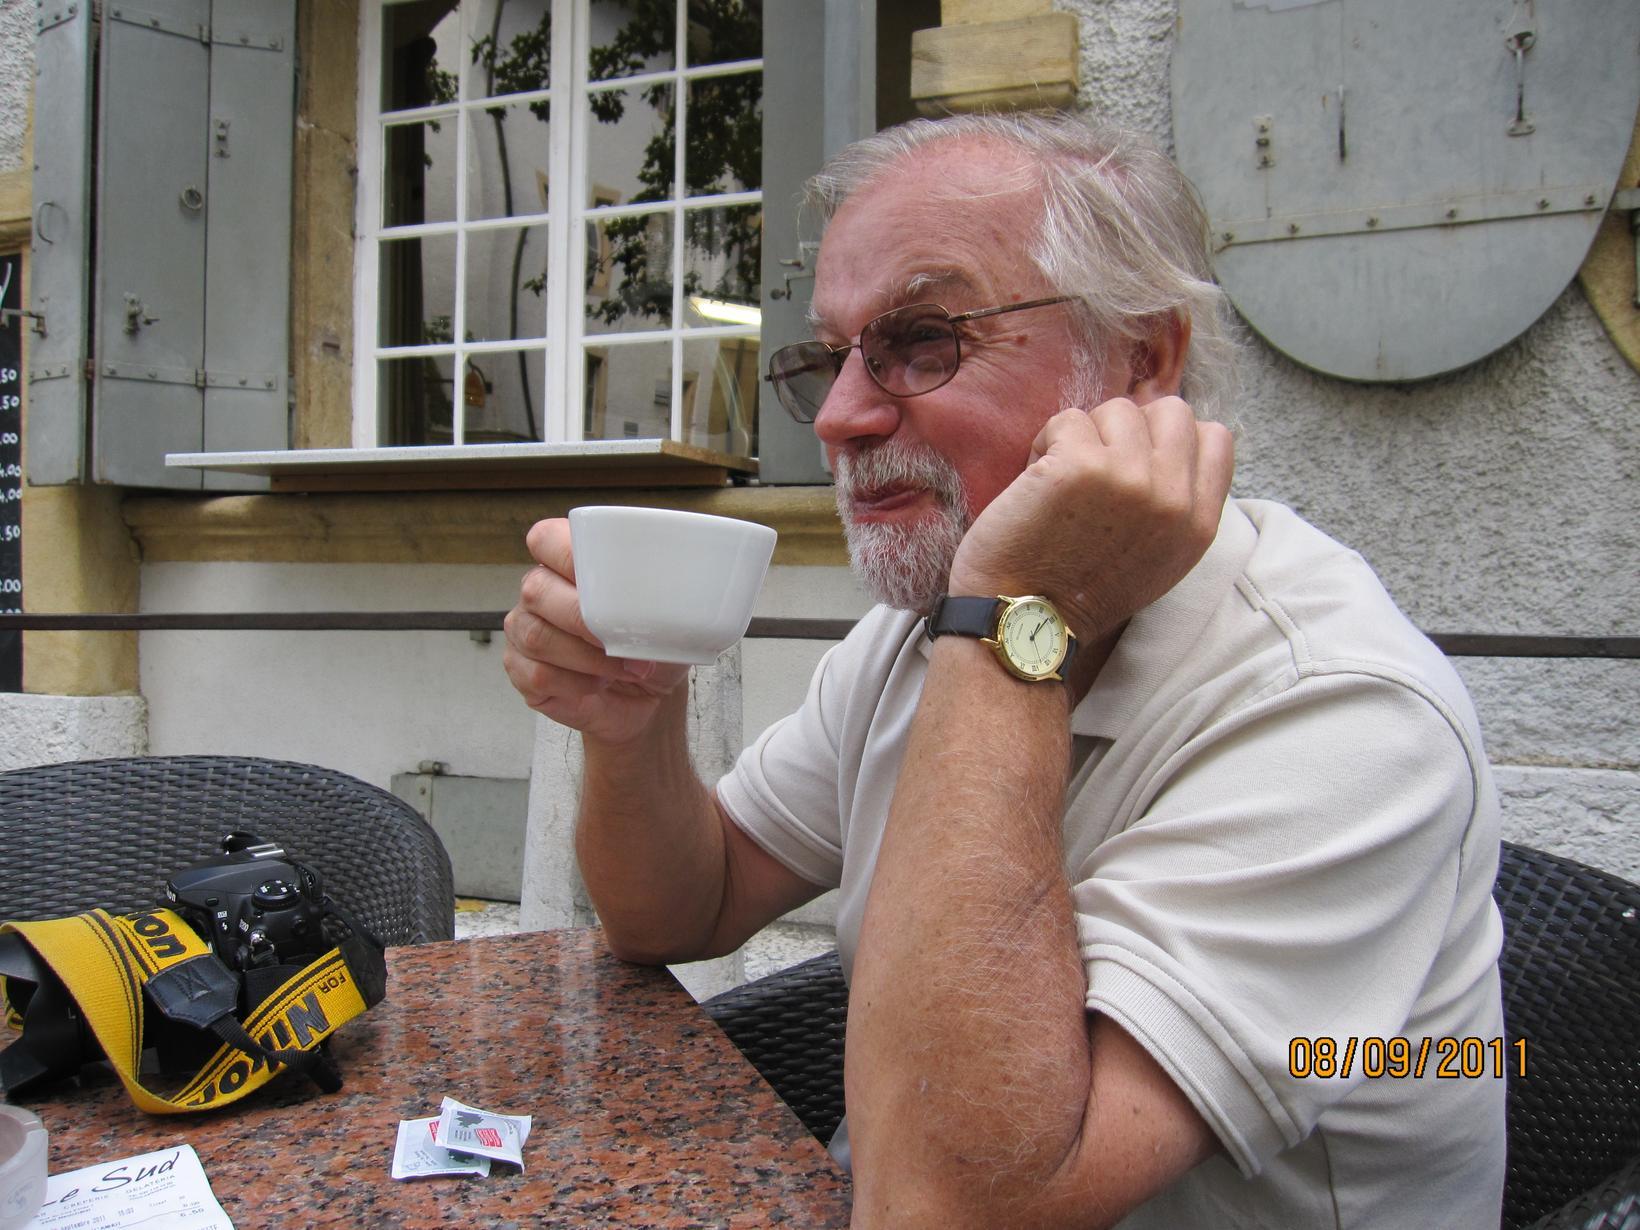 Steve from Hastings, United Kingdom